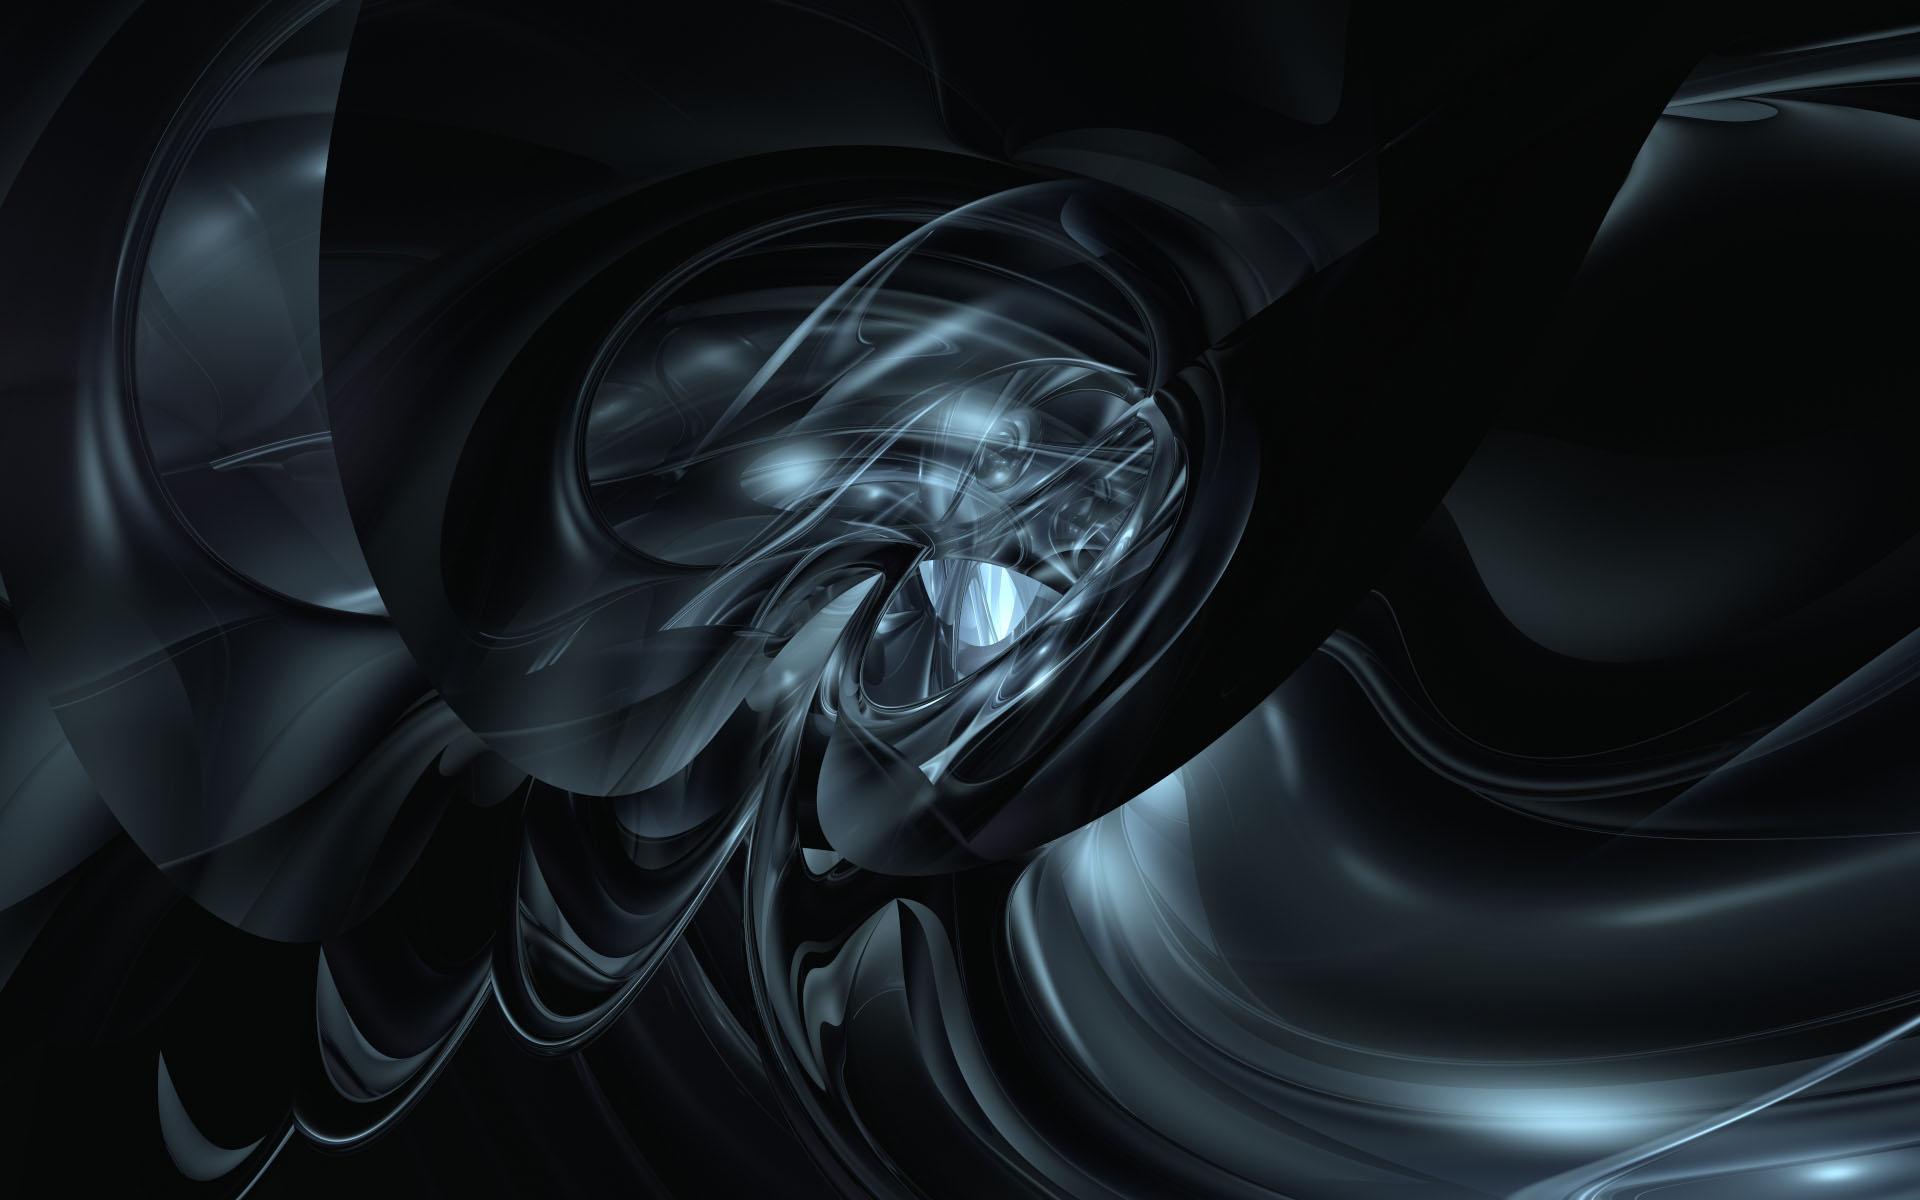 Black 3D Backgrounds HD 1920x1200